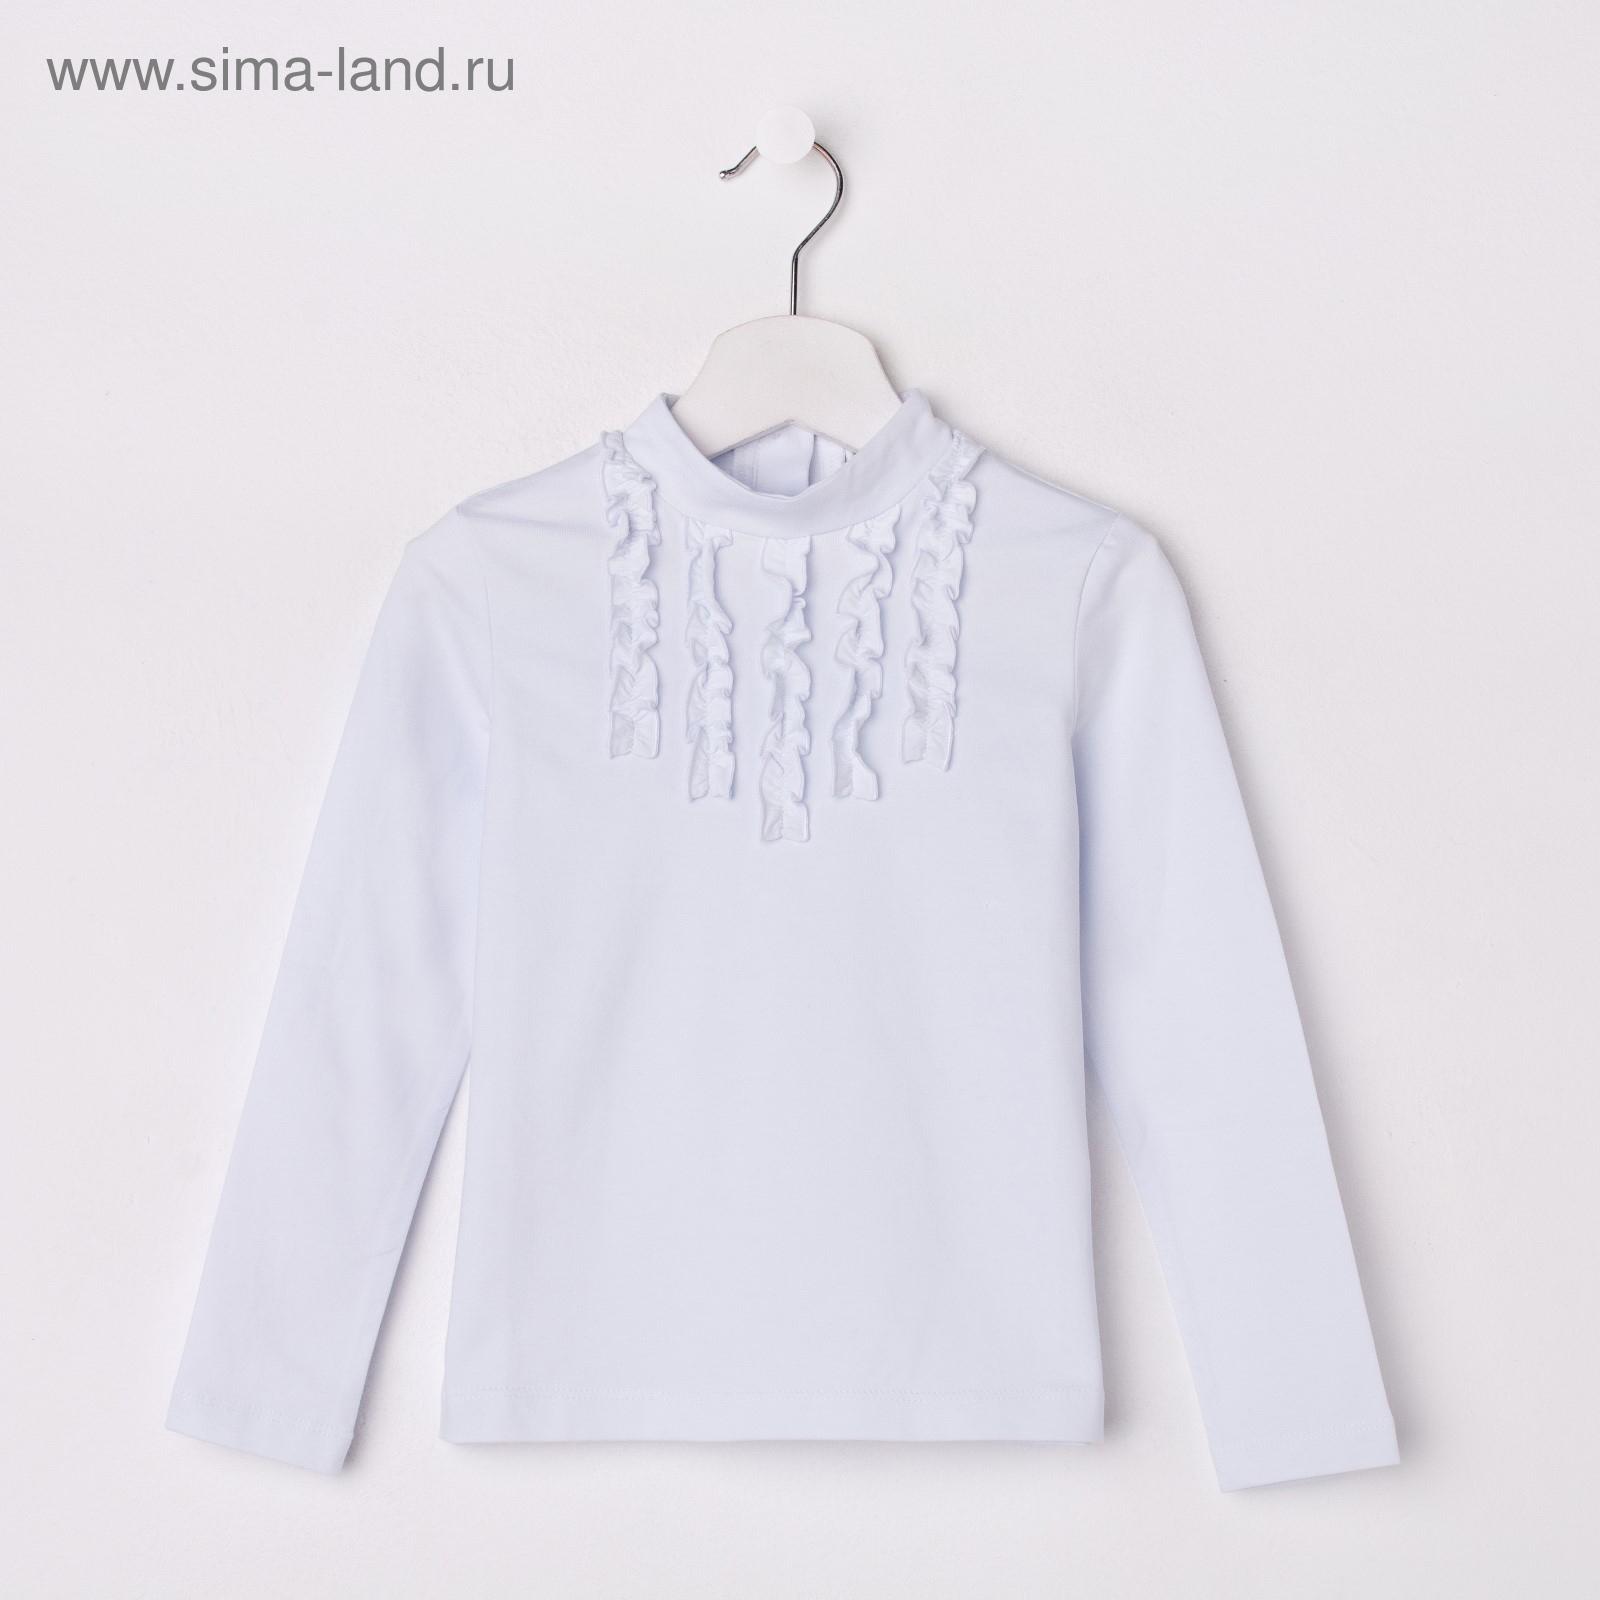 a256ae98d89 Блузка для девочки